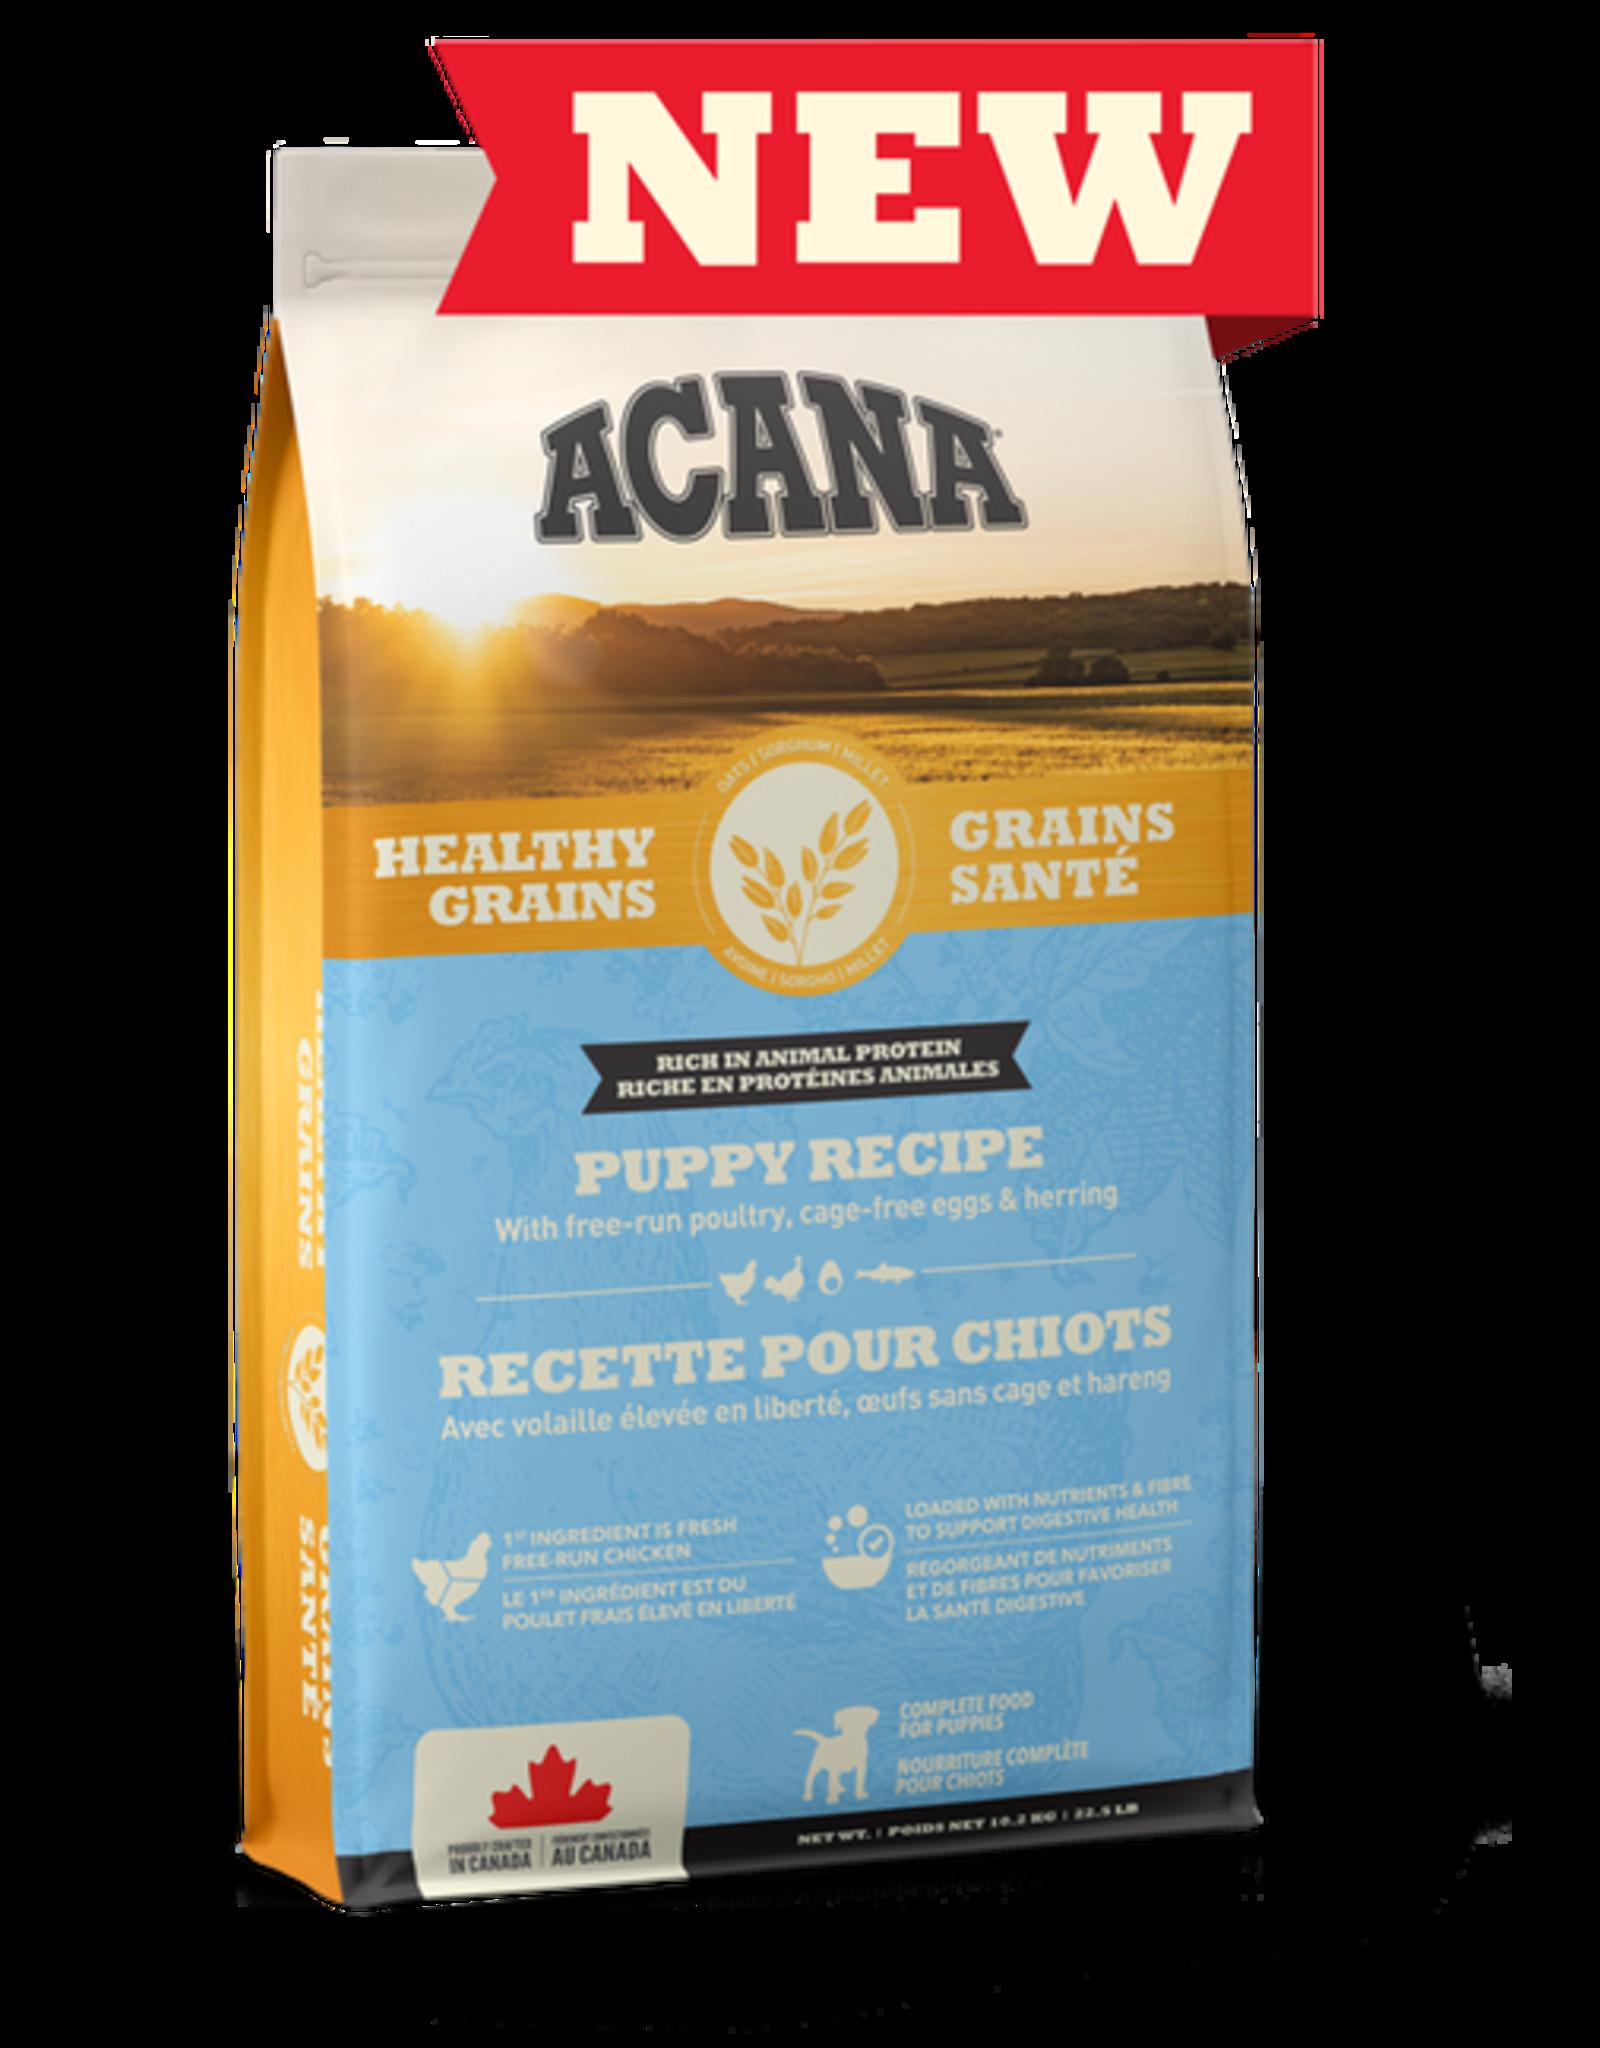 ACANA ACANA HealthyGrains - Puppy Recipe 1.8kg